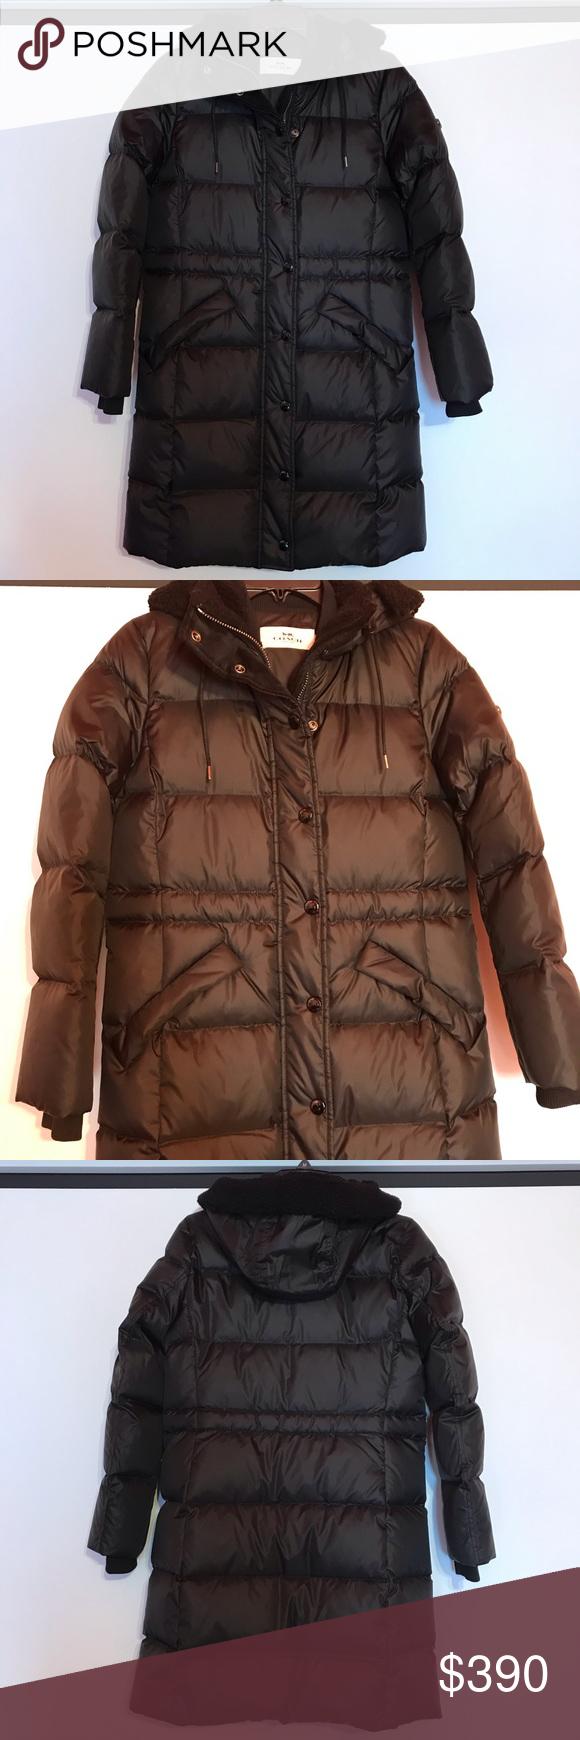 Coach Black Long Puffer Jacket Xsmall Nwt Long Puffer Jacket Jackets Puffer Jackets [ 1740 x 580 Pixel ]